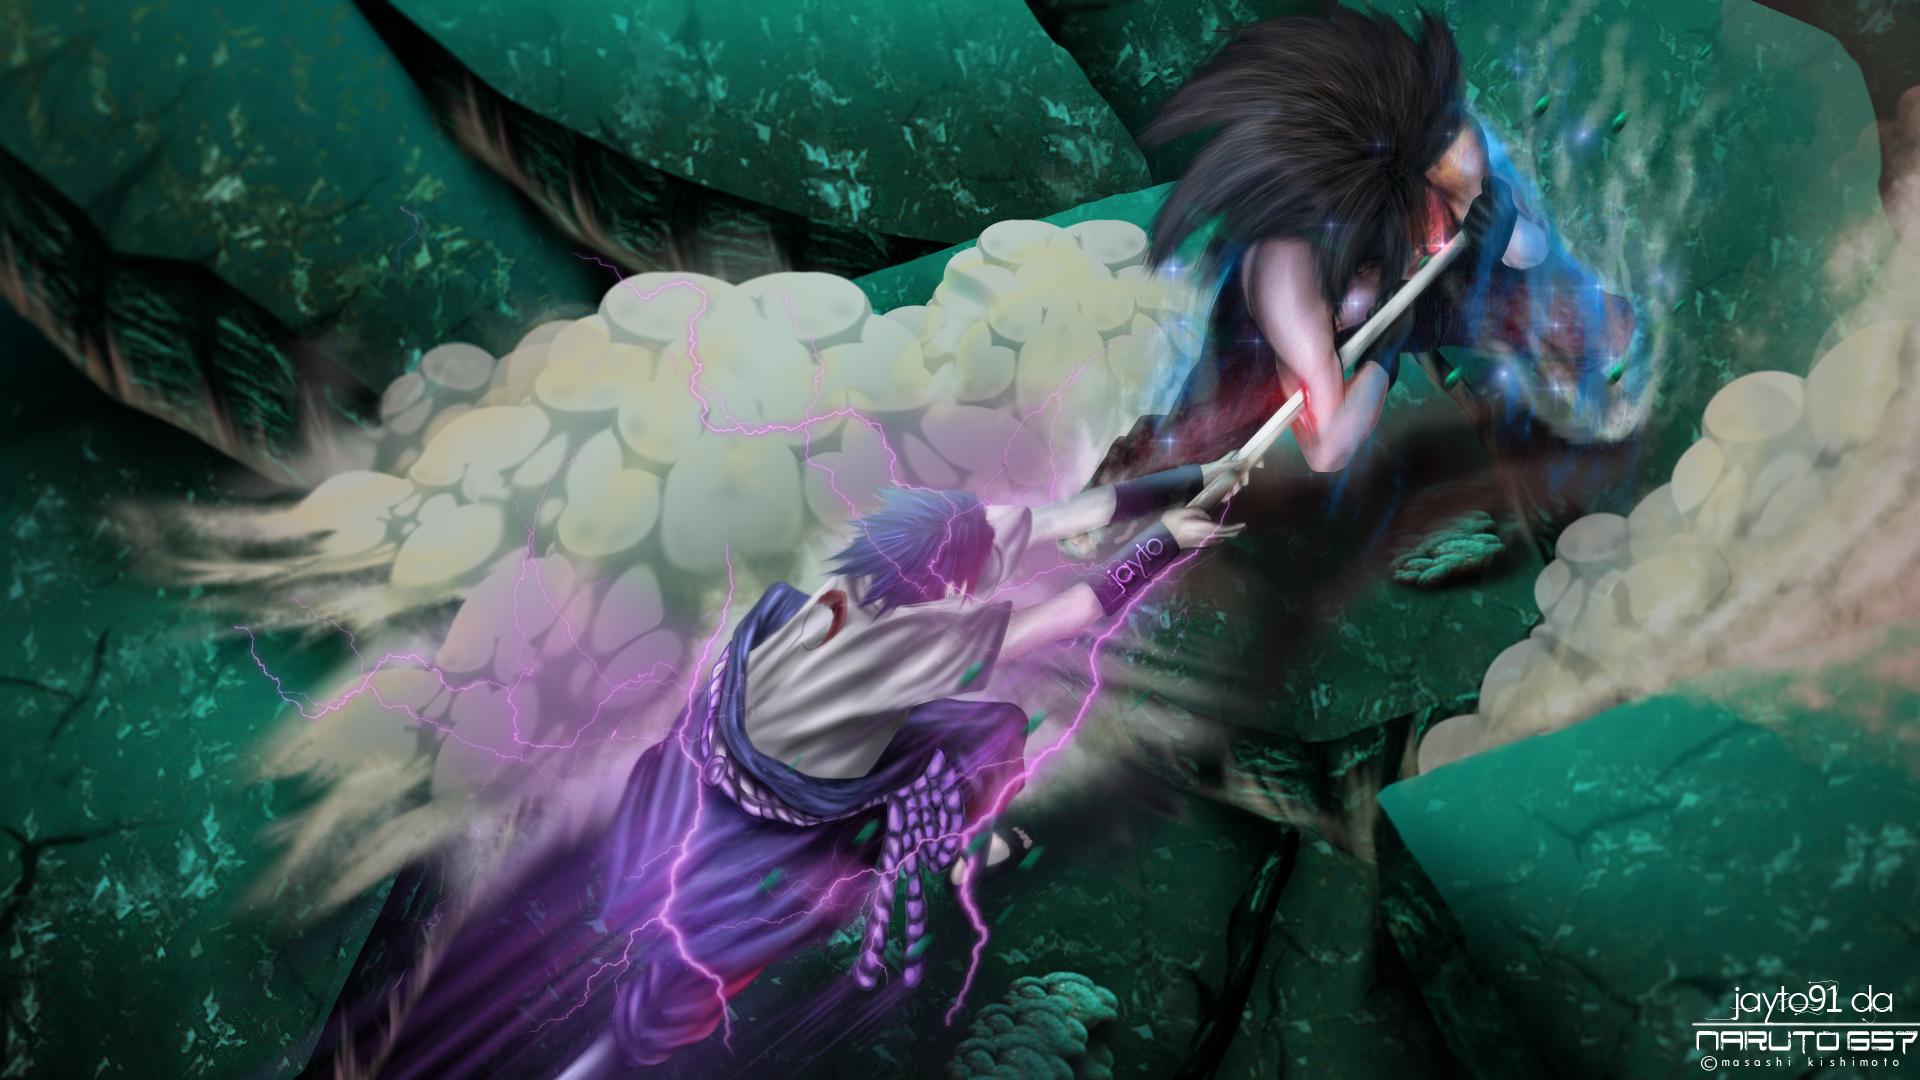 Sasuke vs madara 1x wallpaper hd sasuke vs madara uchiha anime fighting hd wallpaper voltagebd Gallery